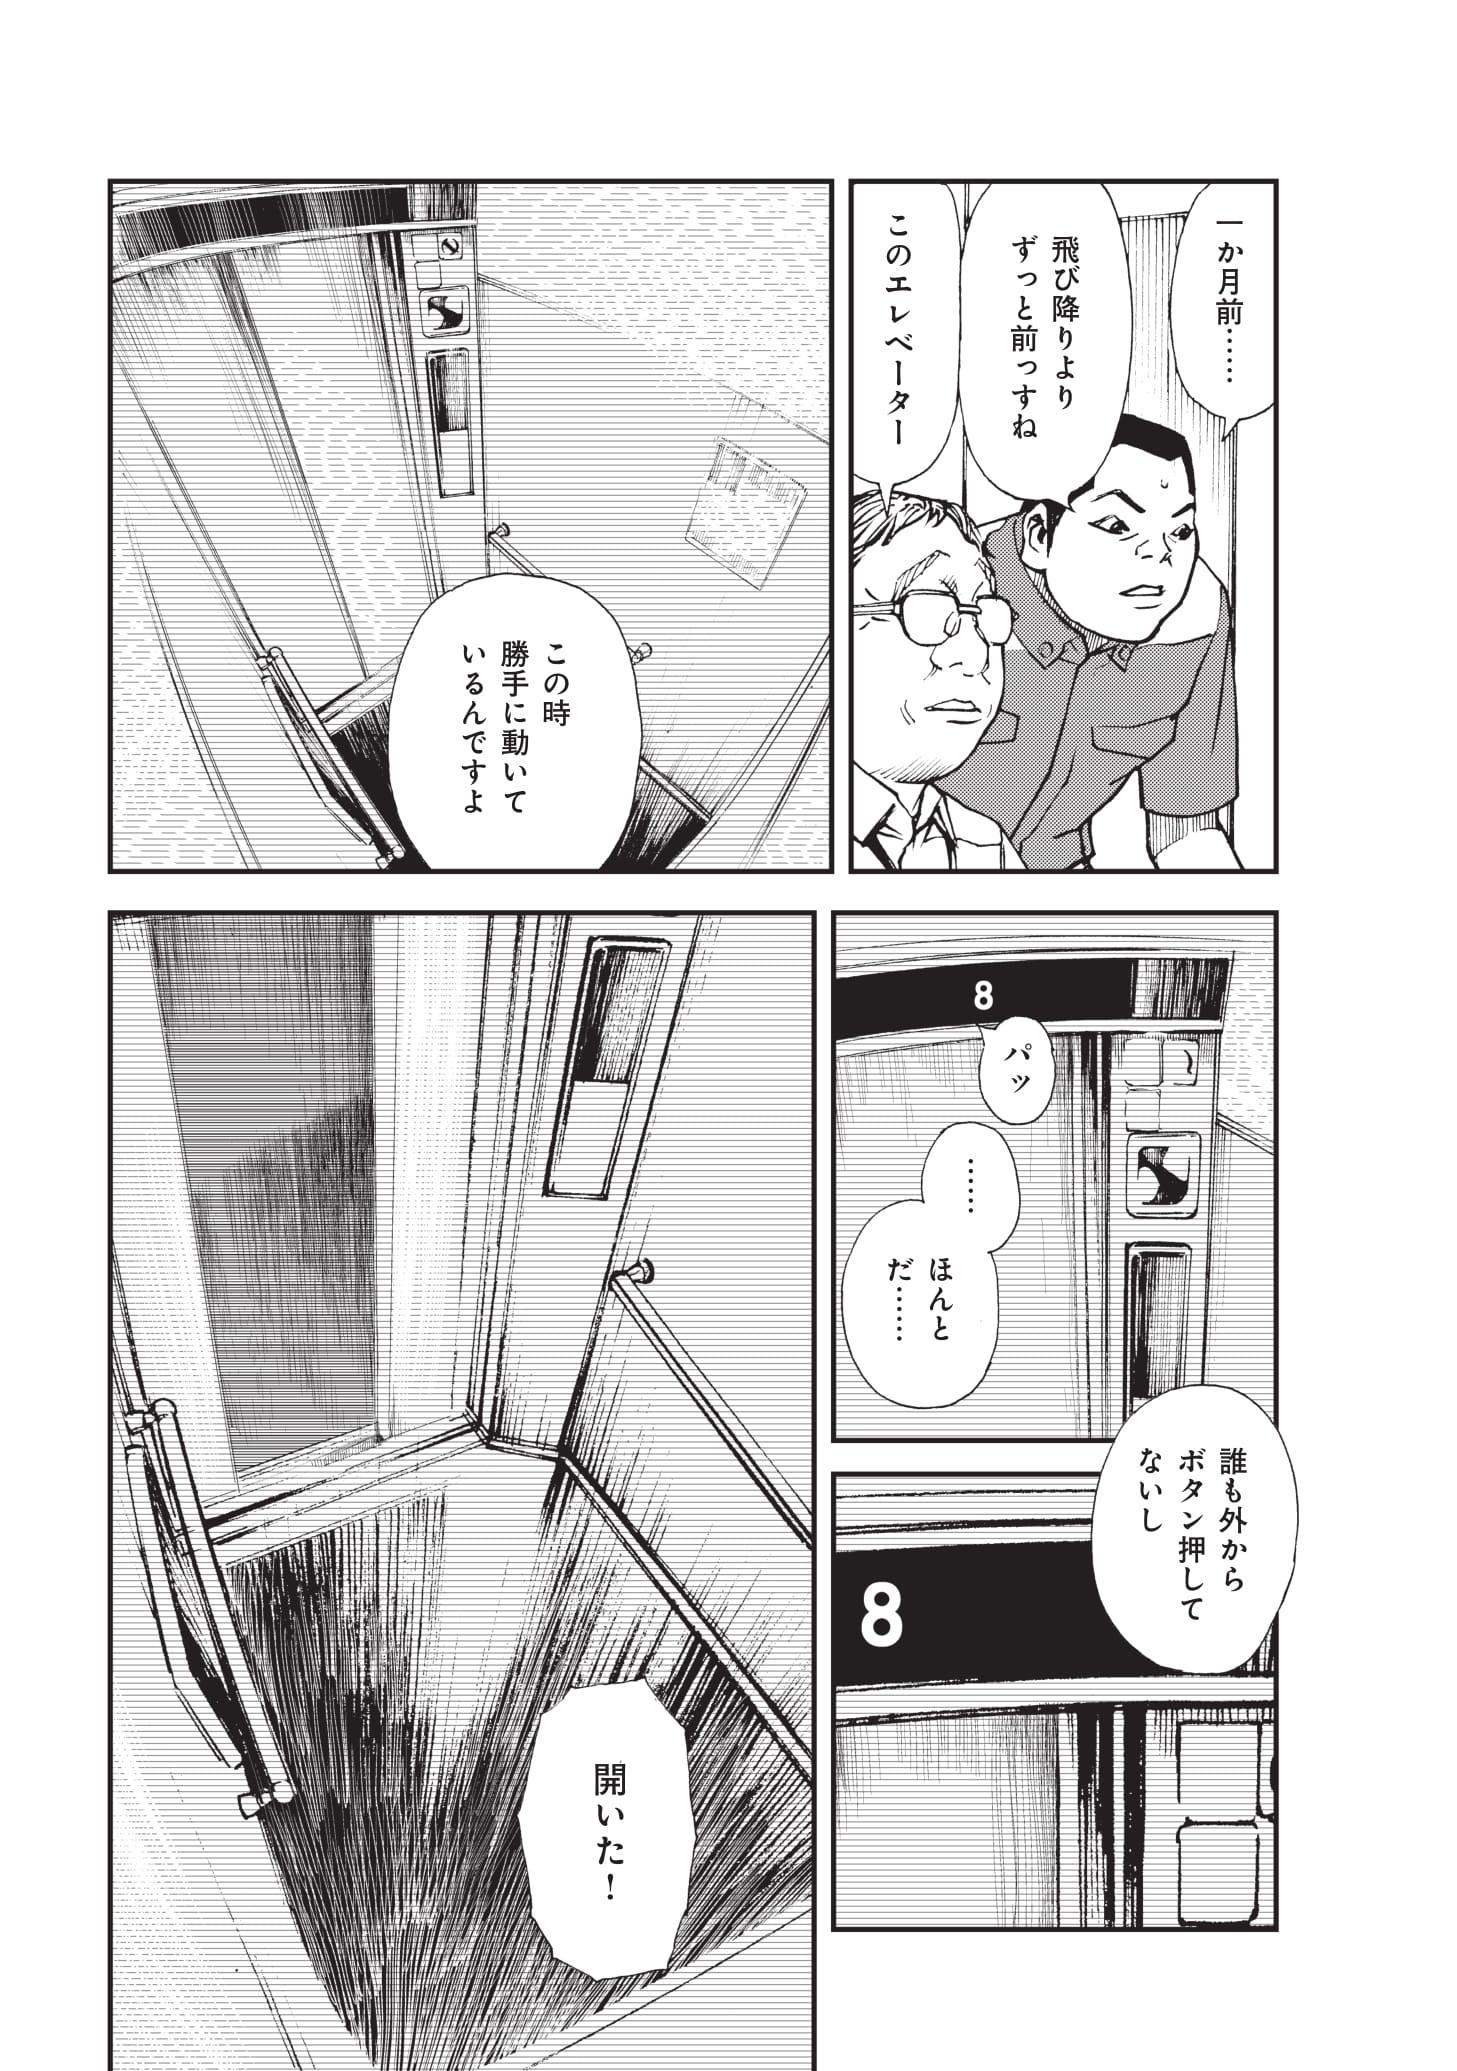 P_270-1.jpg